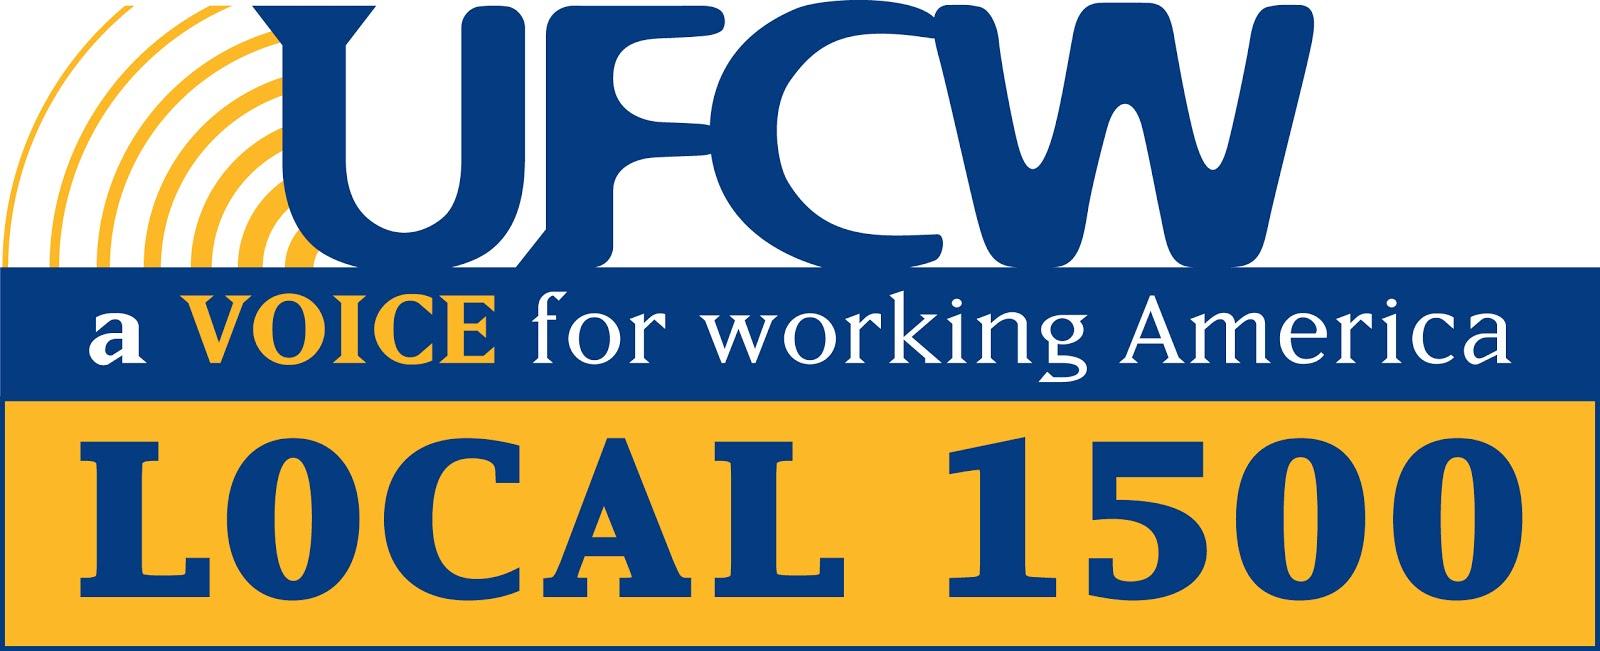 UFCWLocal1500_2cTag.jpg